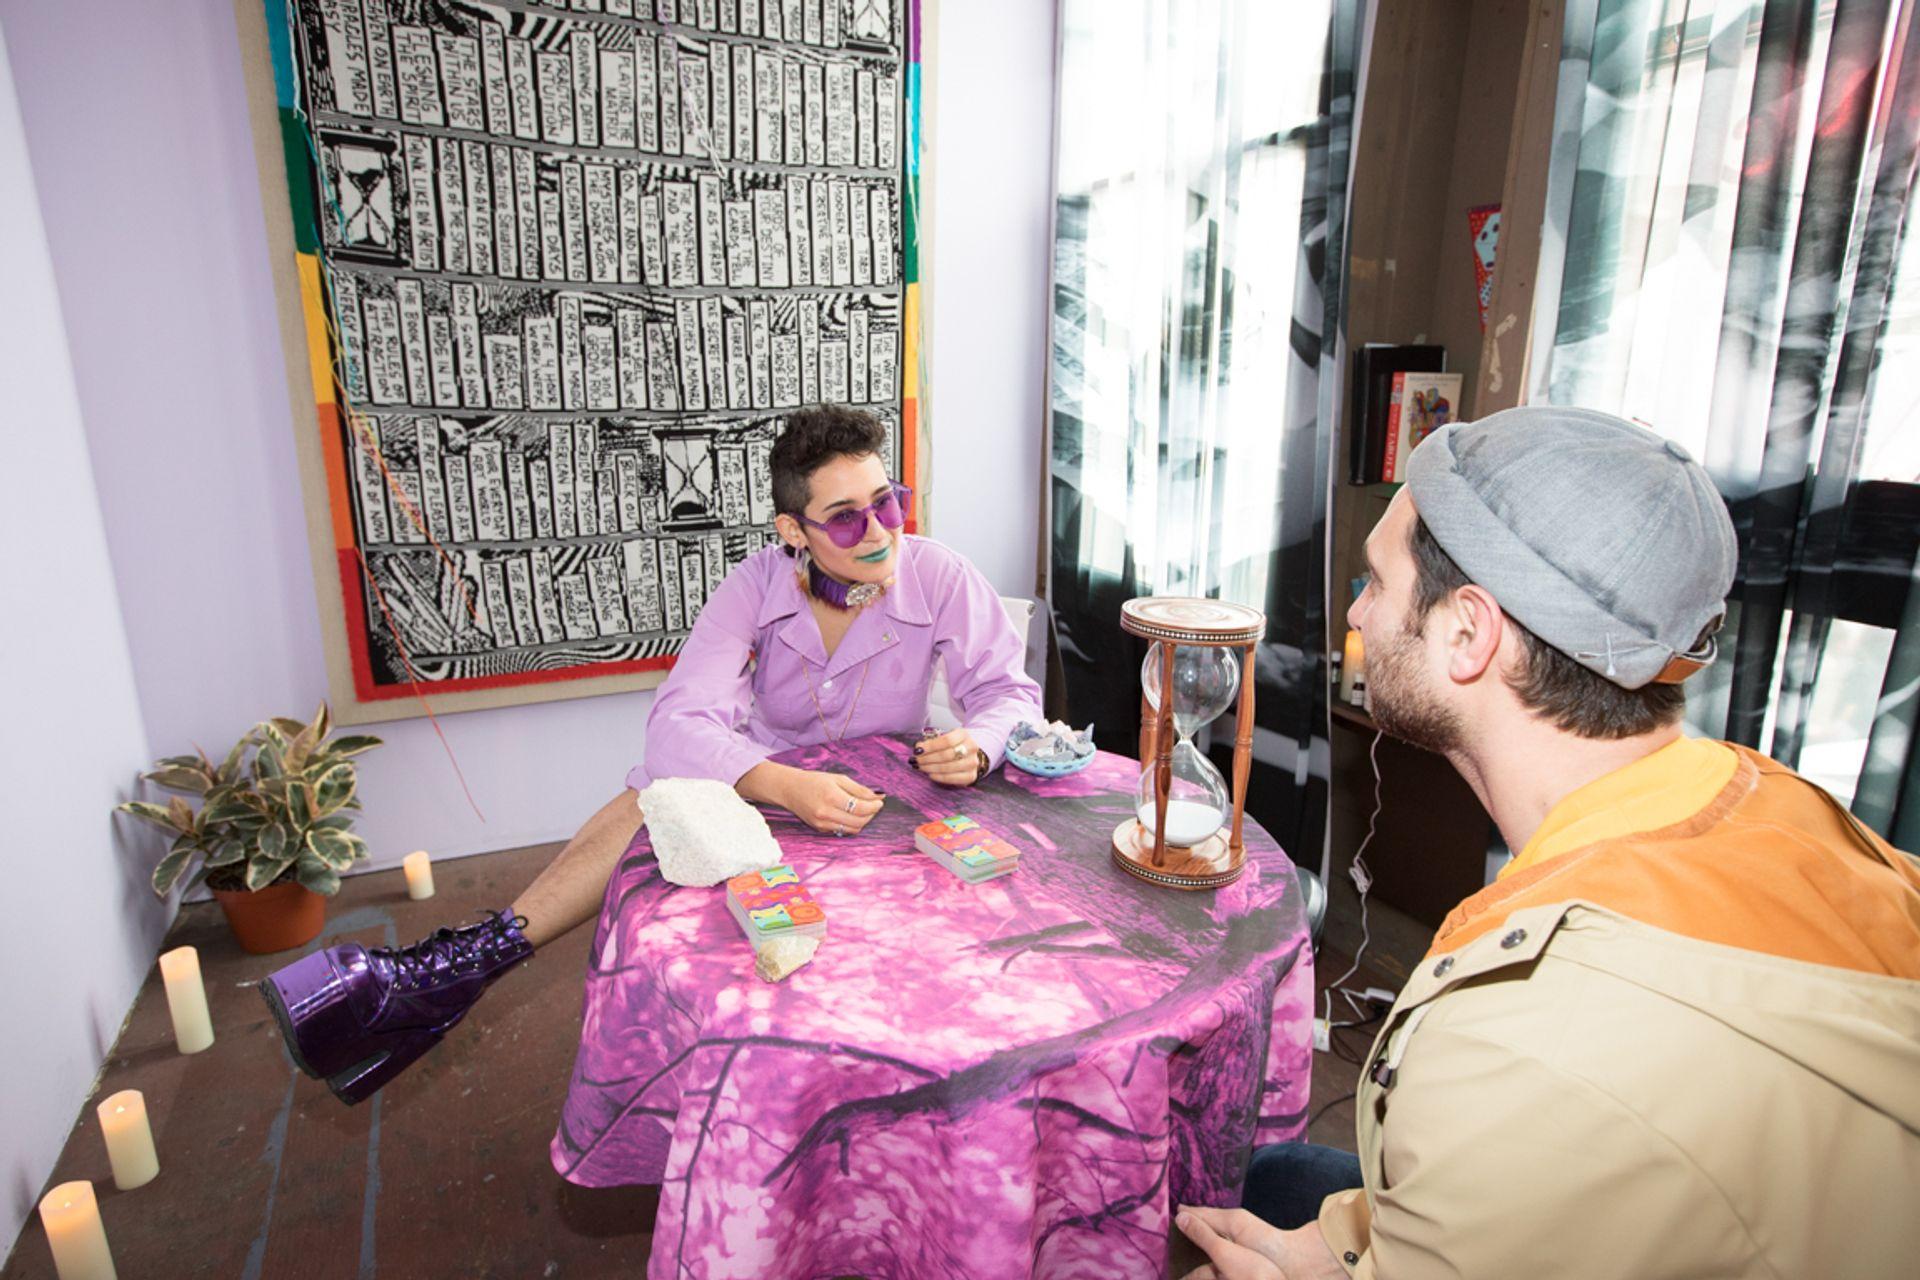 Lisa Anne Auerbach's Psychic Art Advisor (2019), part of Frieze Los Angeles projects Photo: www.david-owens.co.uk